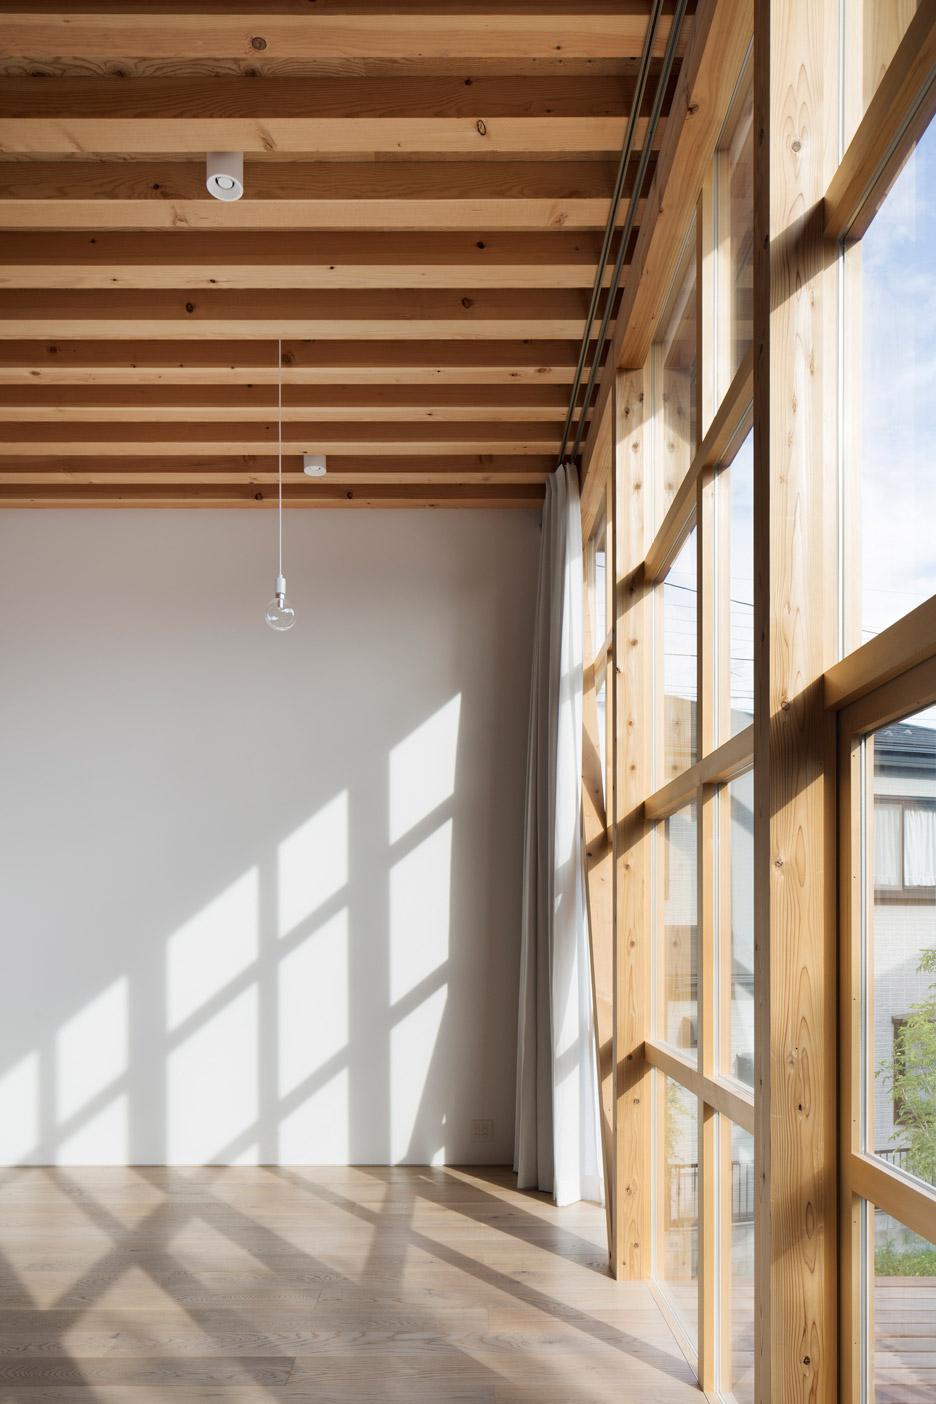 module-grid-house-tetsuo-yamaji-architects-kanto-japan_dezeen_936_7